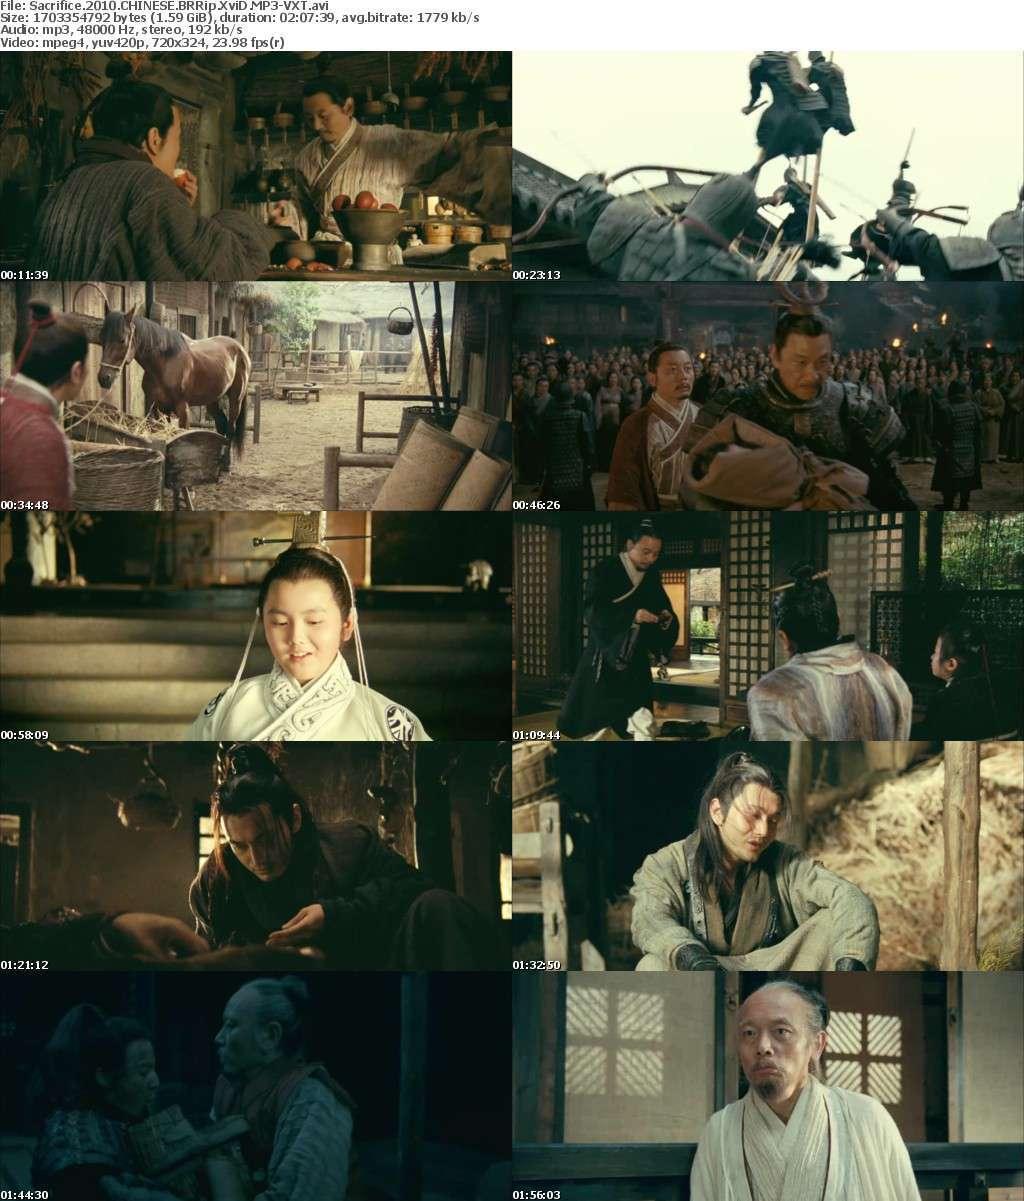 Sacrifice 2010 CHINESE BRRip XviD MP3-VXT